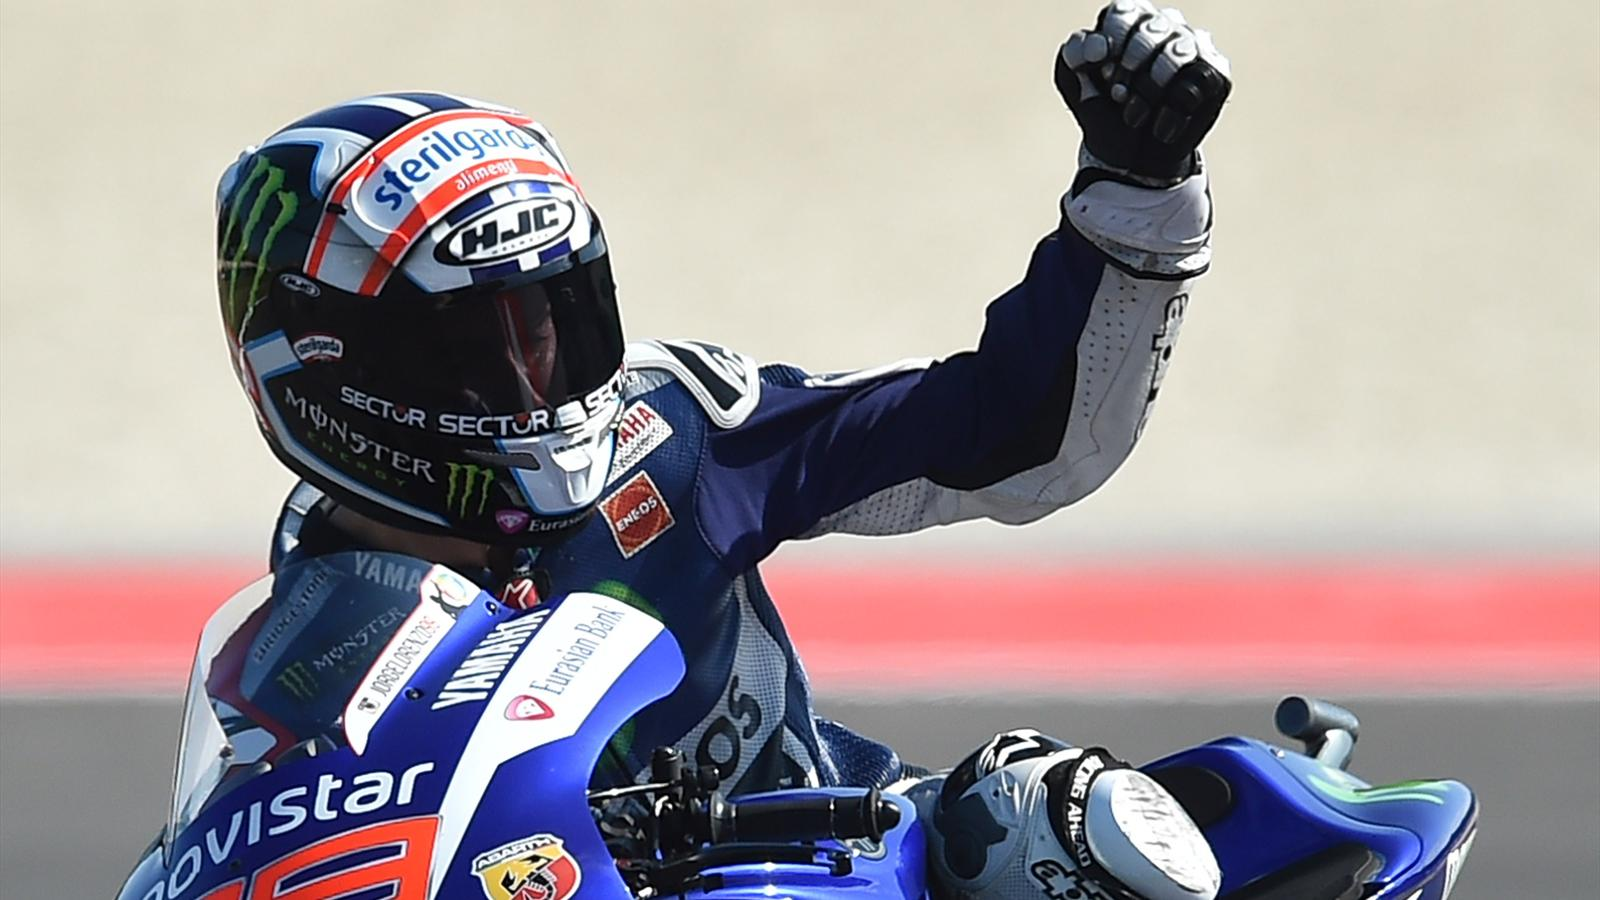 jorge lorenzo yamaha champion du monde de motogp grand prix de valence 2015 moto eurosport. Black Bedroom Furniture Sets. Home Design Ideas